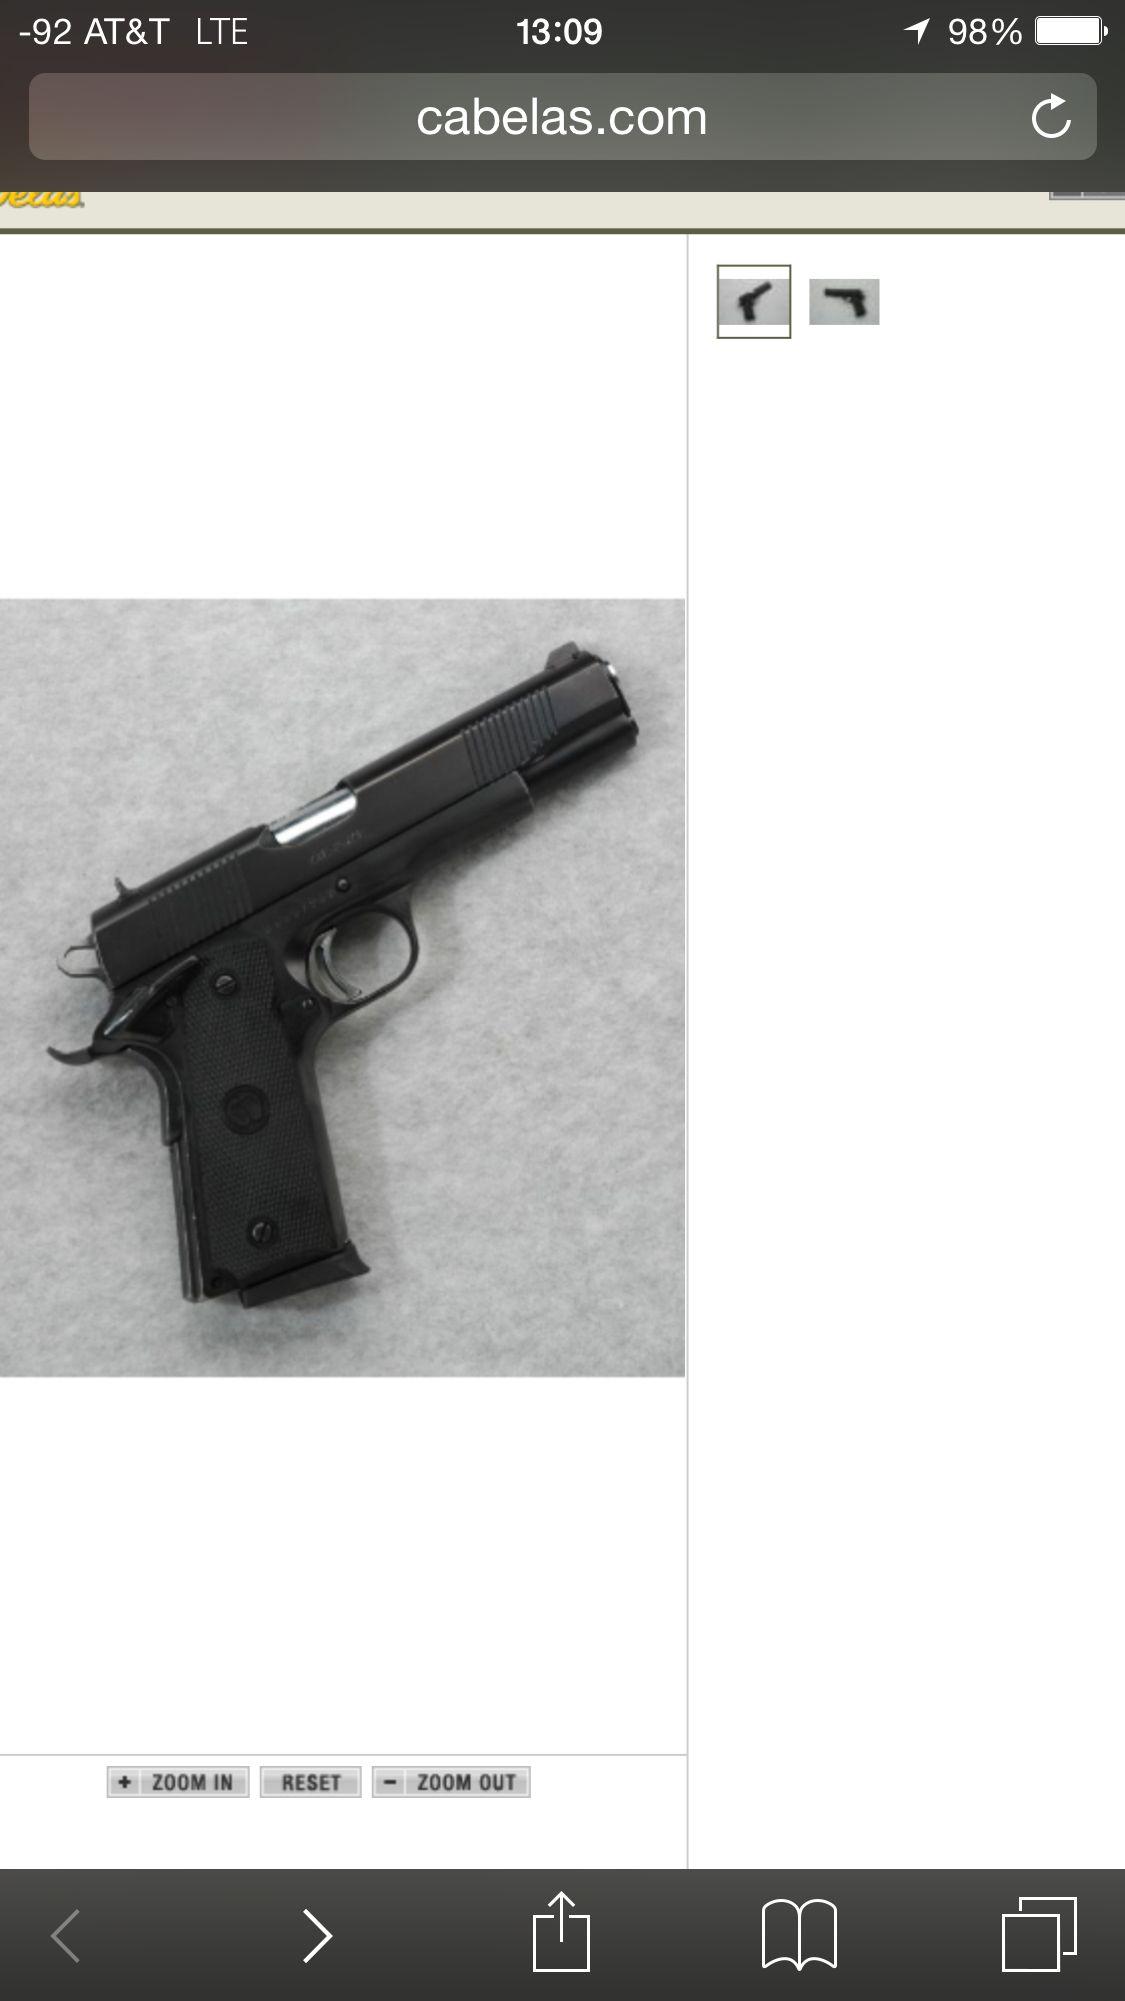 Charles Daly 191145 acp Hand guns, Guns, 45 acp